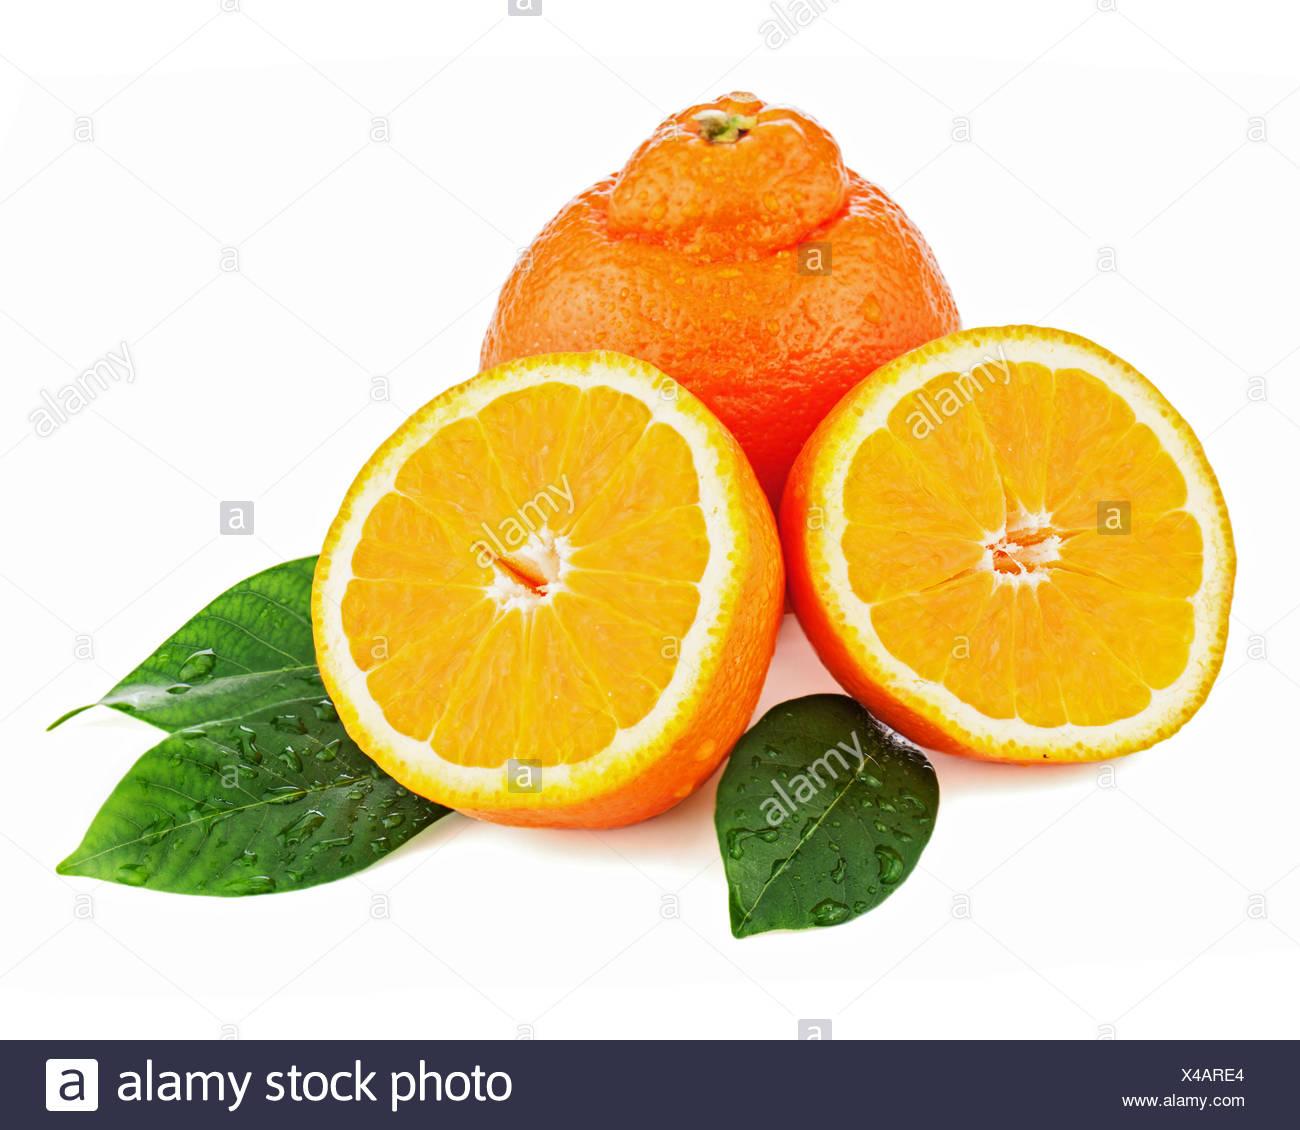 Fresh orange fruit with green leaves isolated on white background. Closeup. - Stock Image